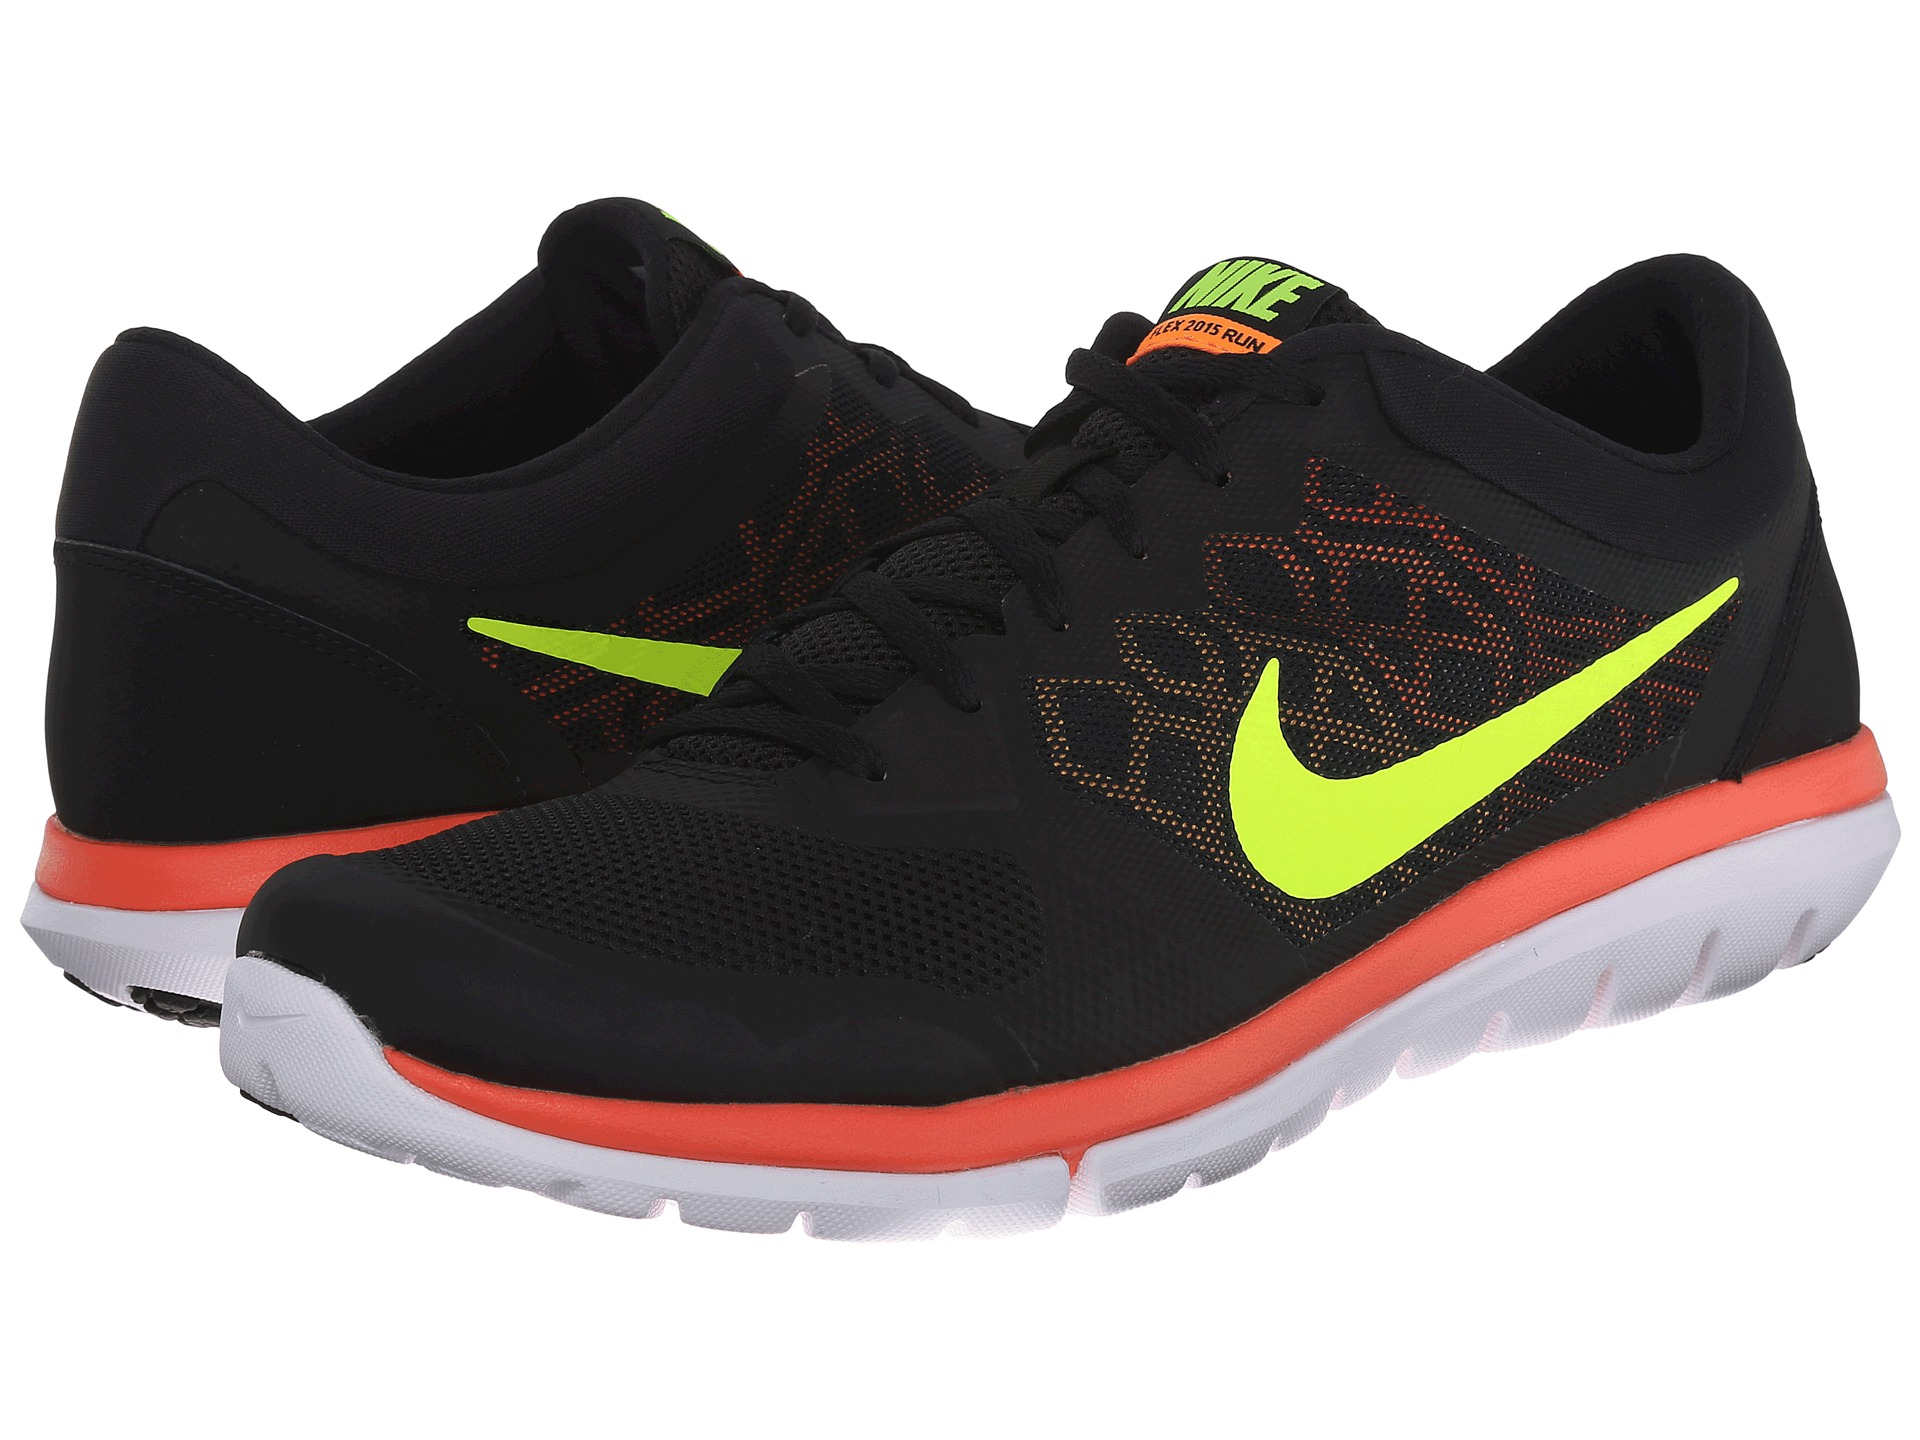 c5e46b8b3beb Lyst - Nike Flex 2015 Run for Men